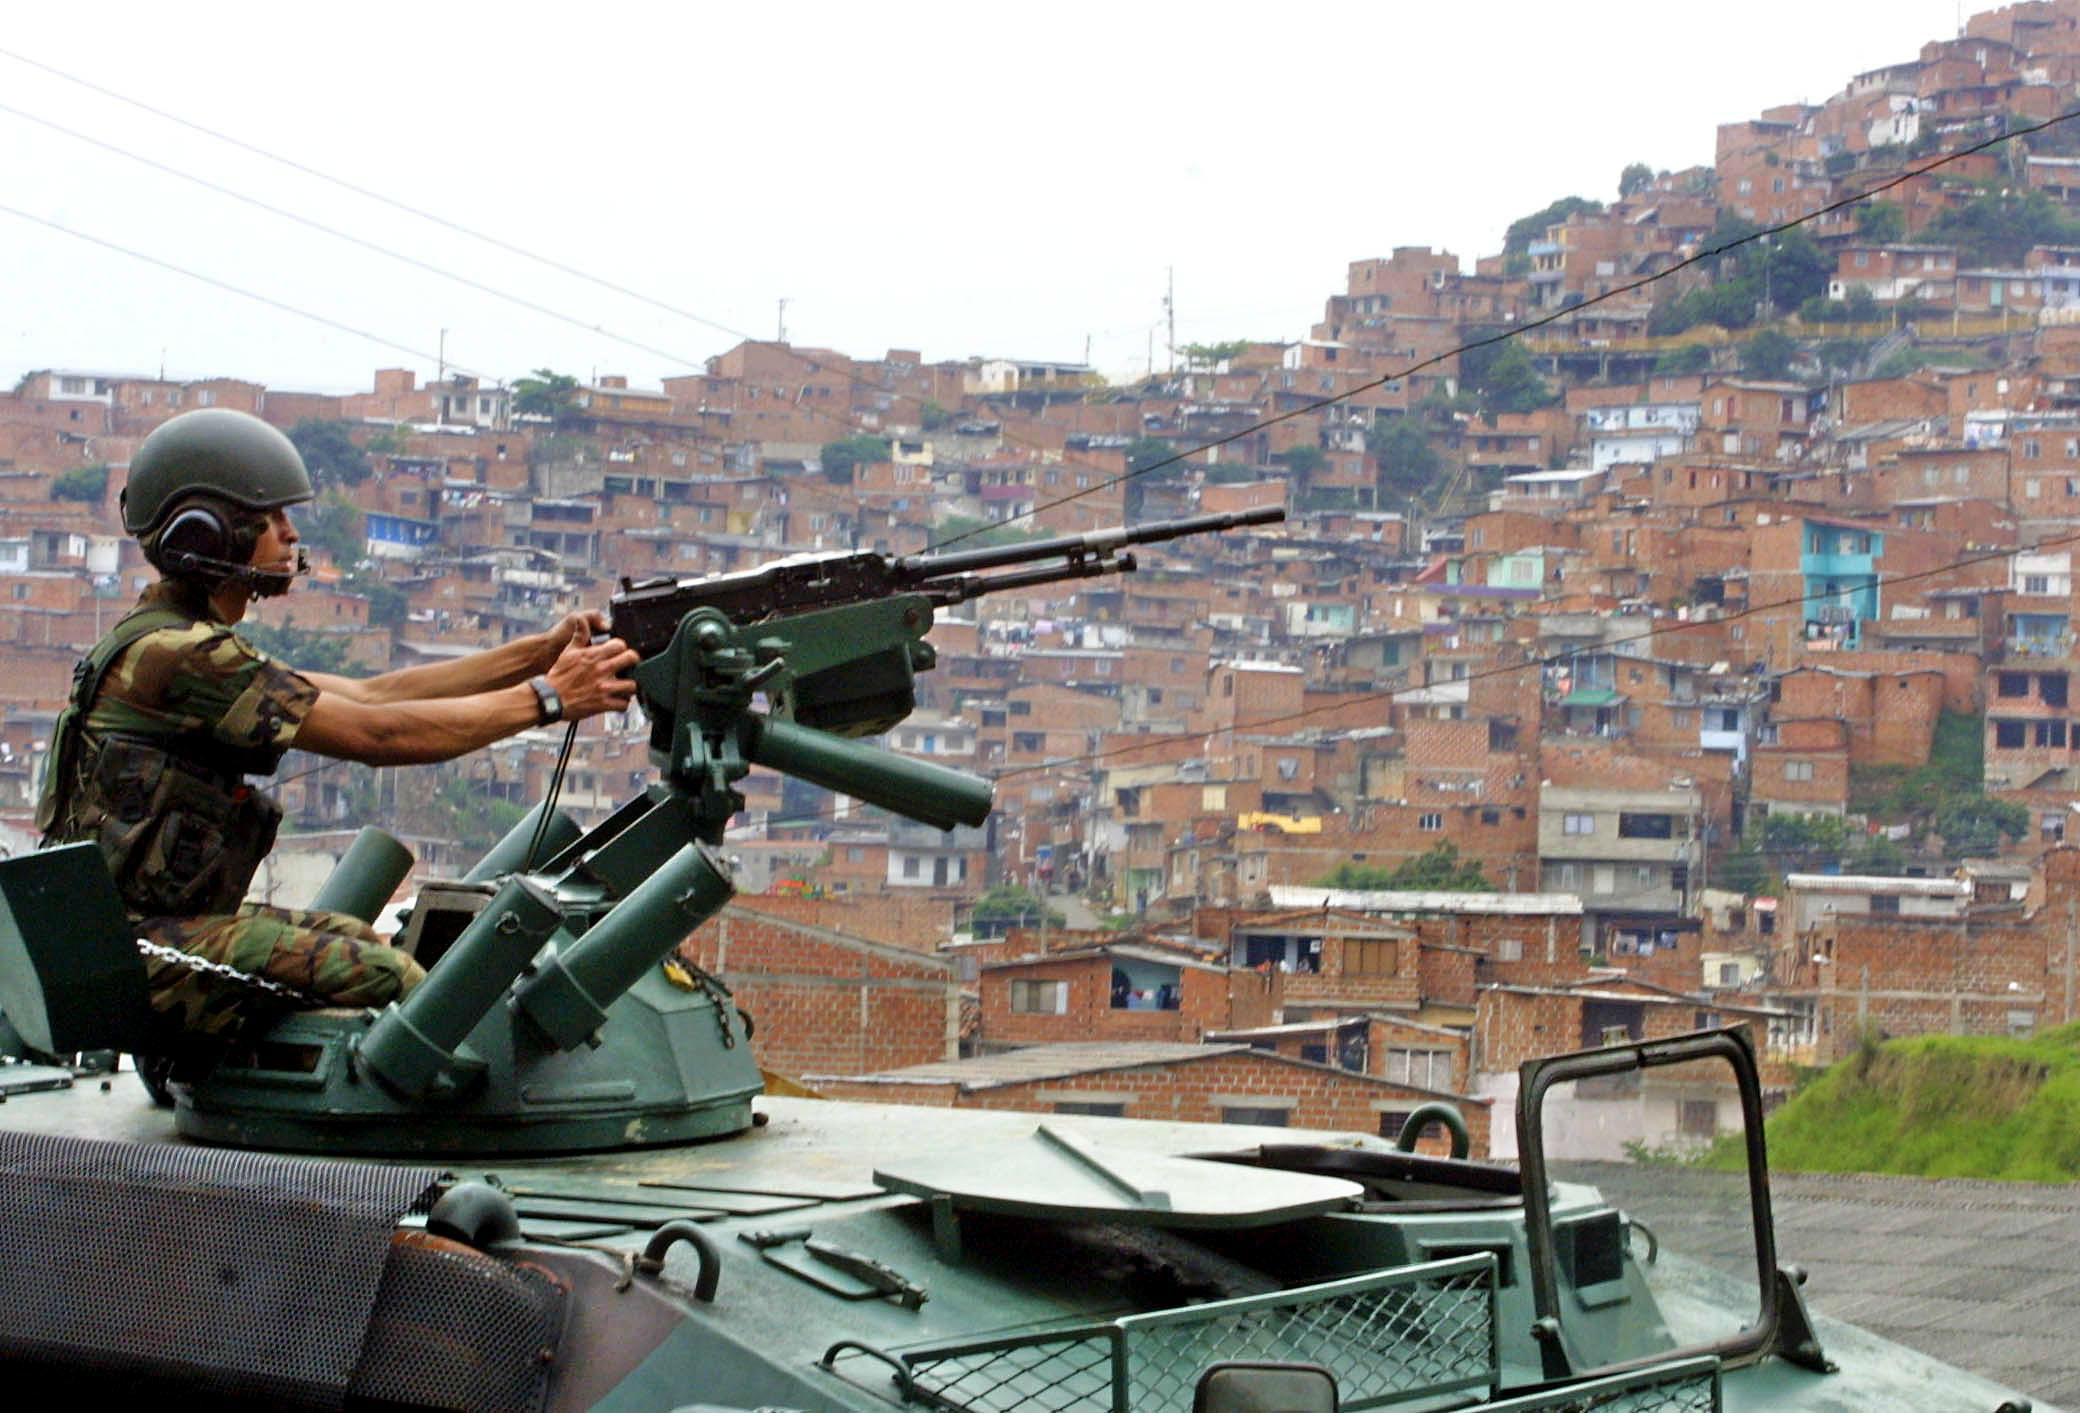 Operación Orión: ¿verdades contadas a medias? | La FM